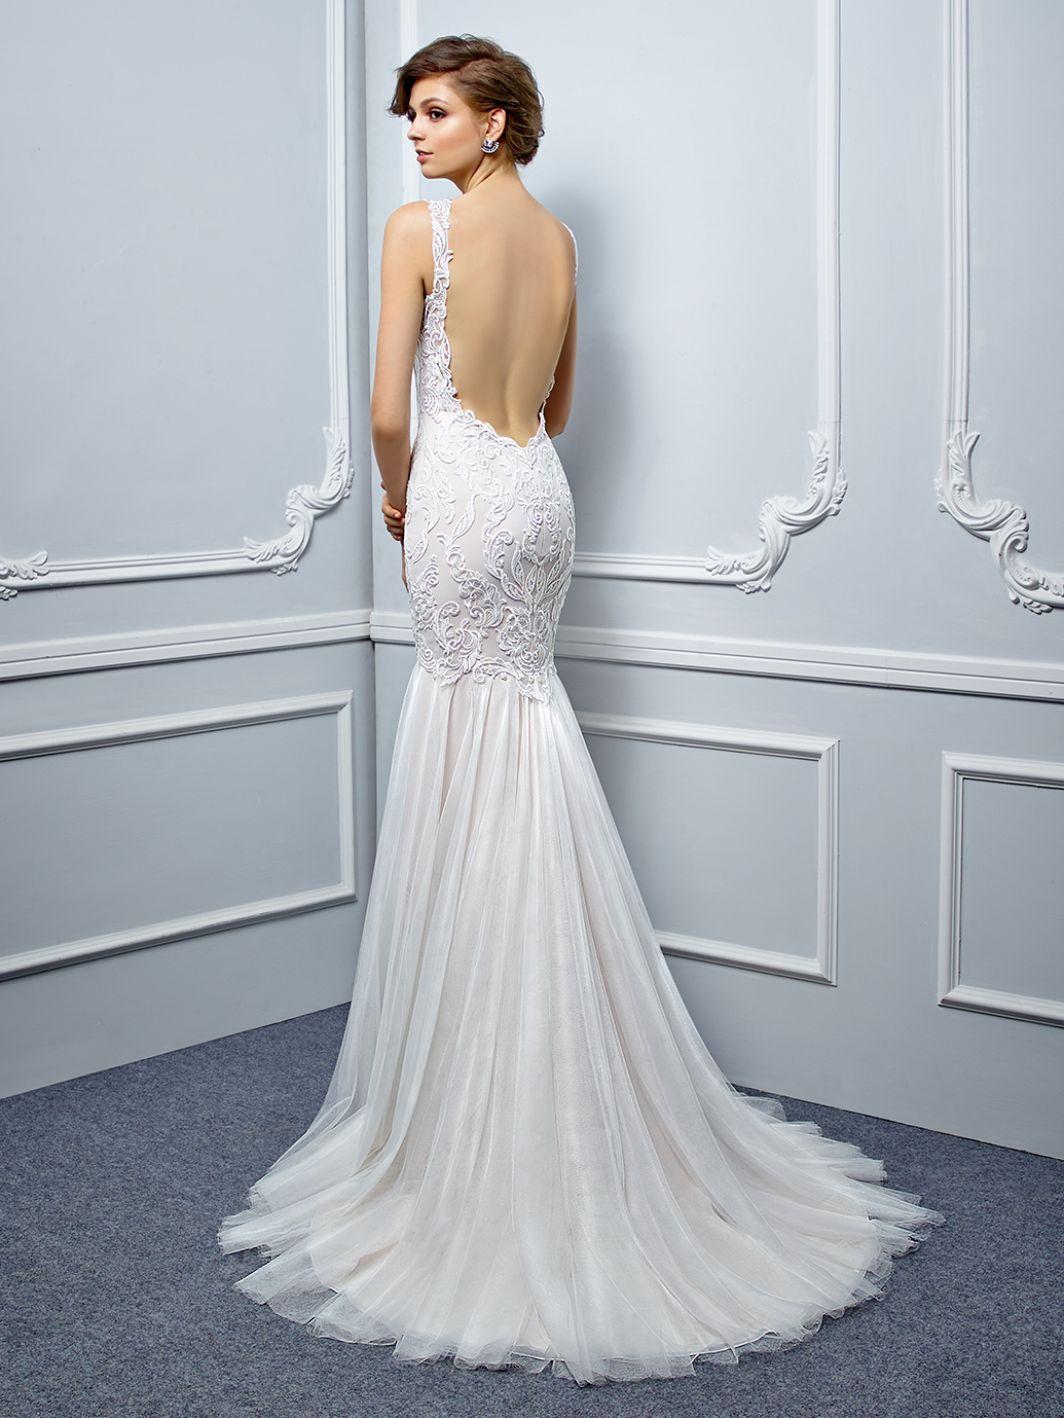 Outstanding Guipure Lace Wedding Dress Crest - Womens Dresses ...